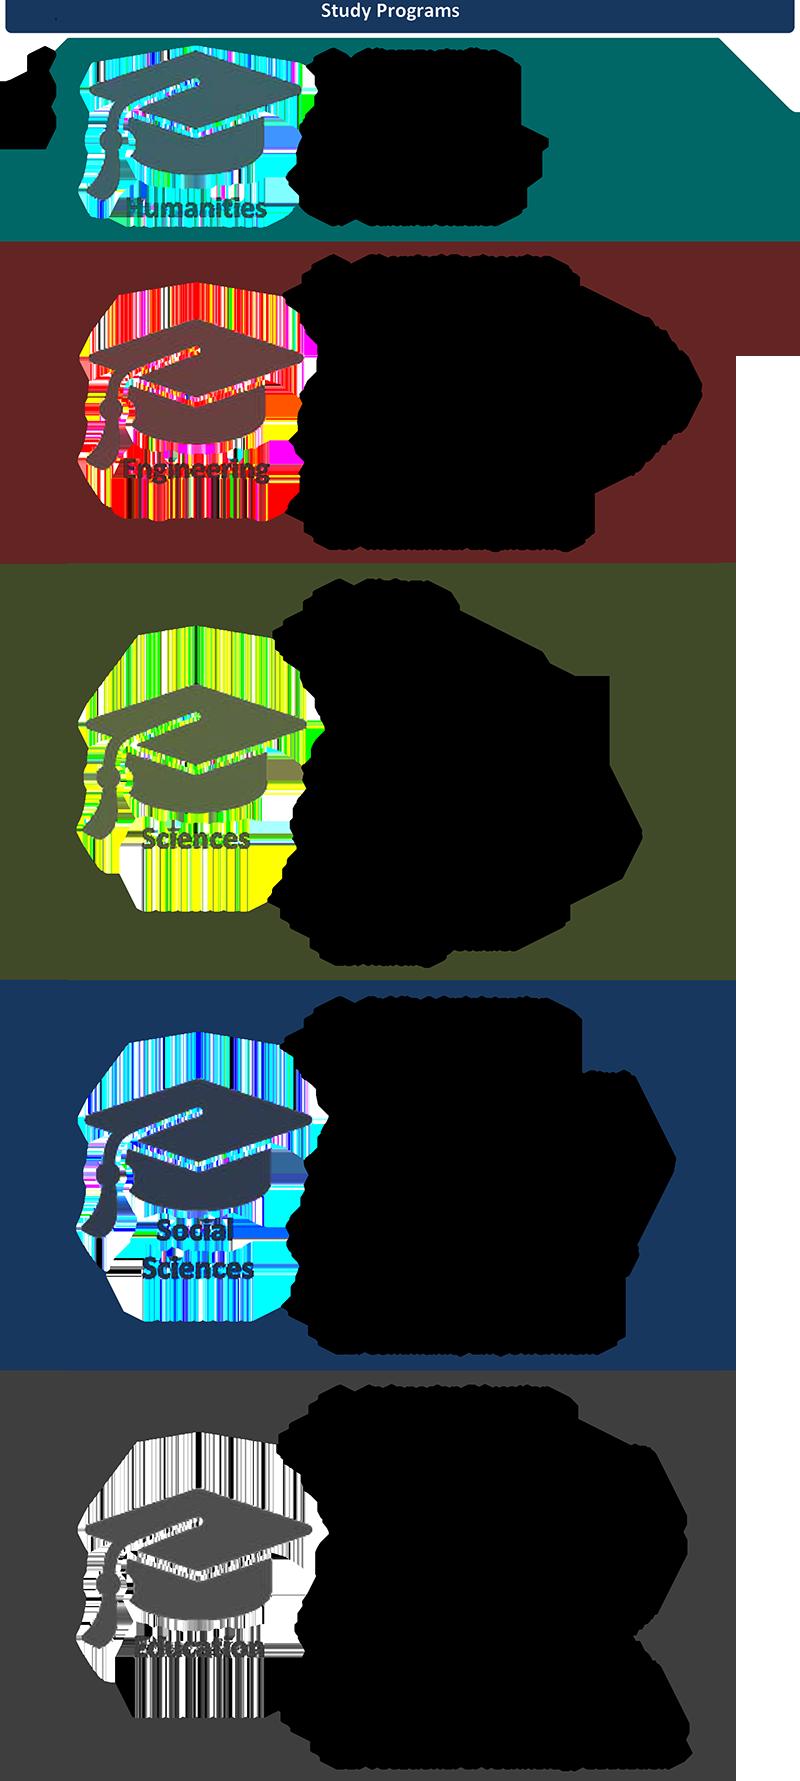 The Kemitraan Negara Bekembang (KNB) Scholarship